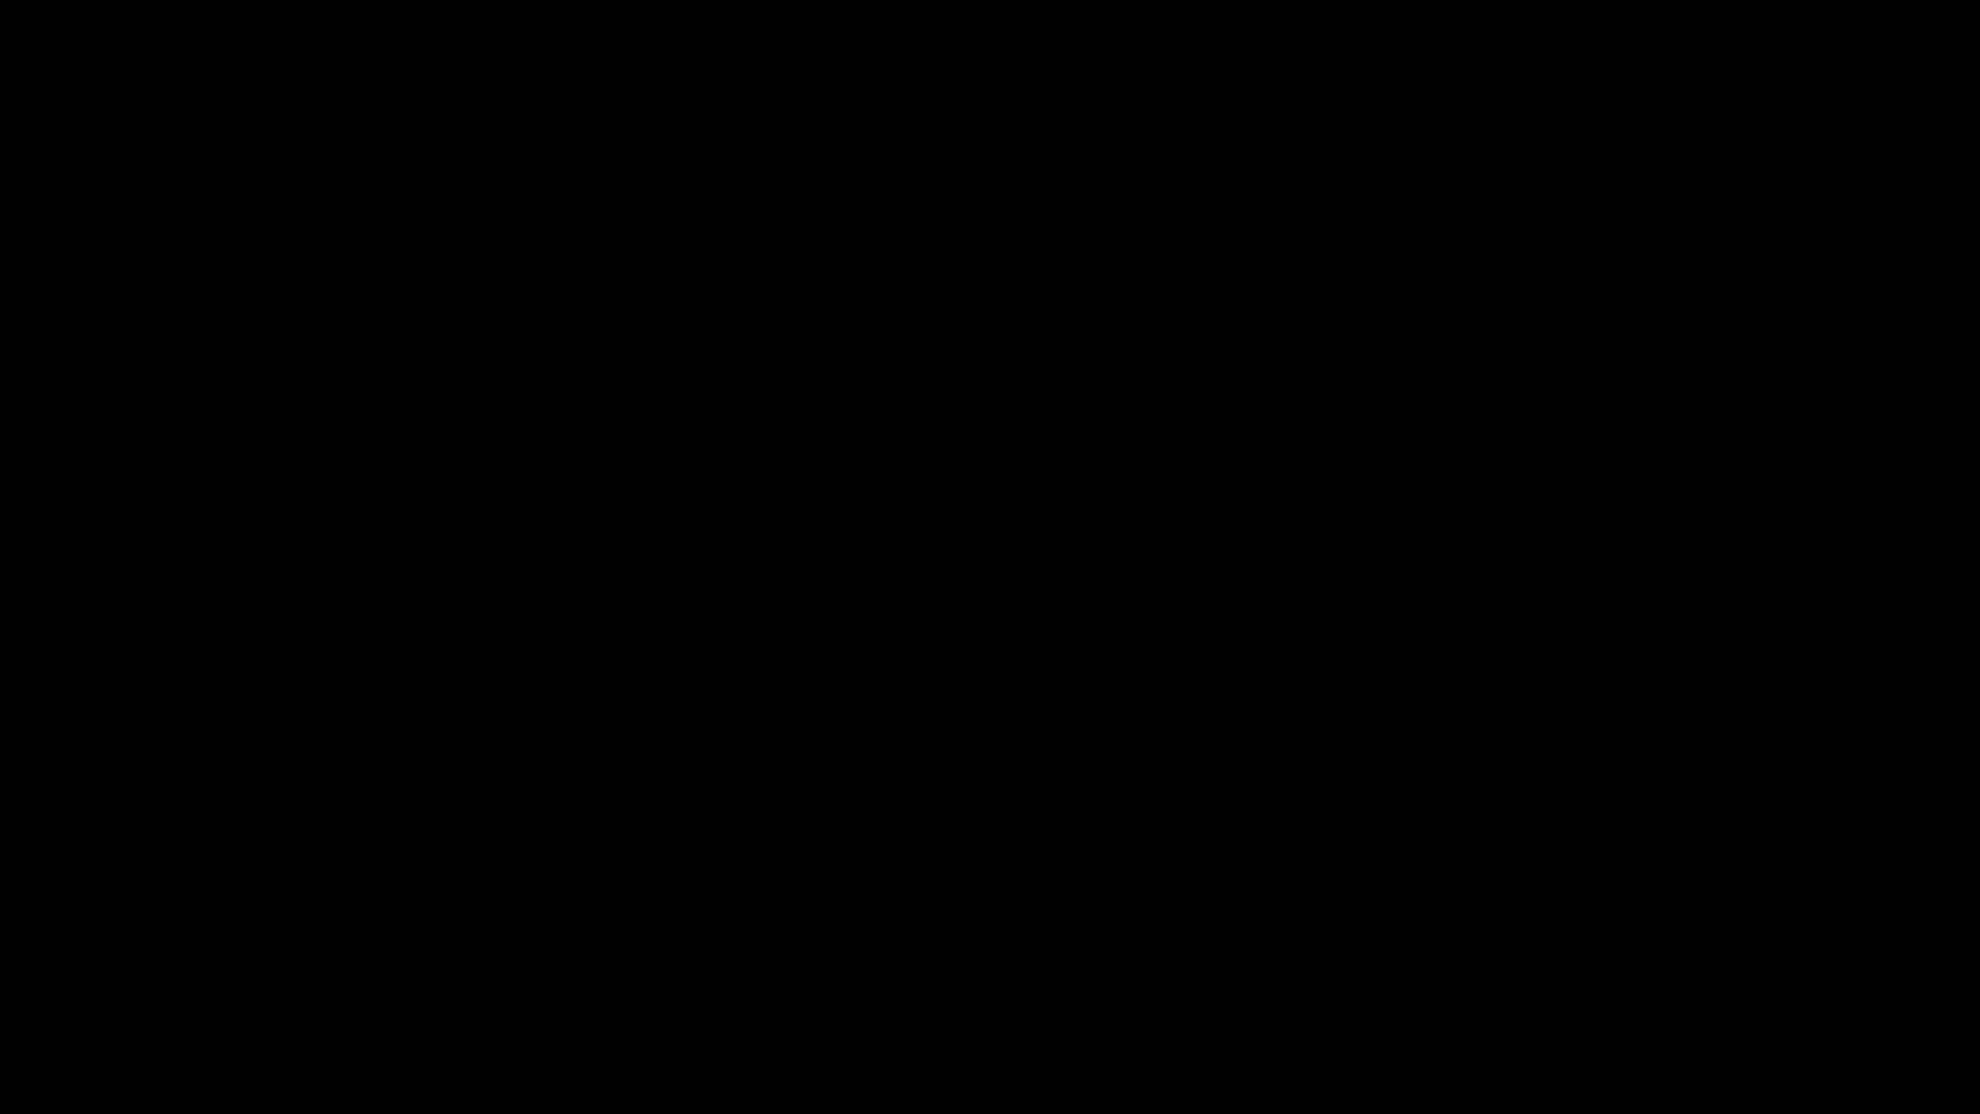 dinning-tw-01-test5